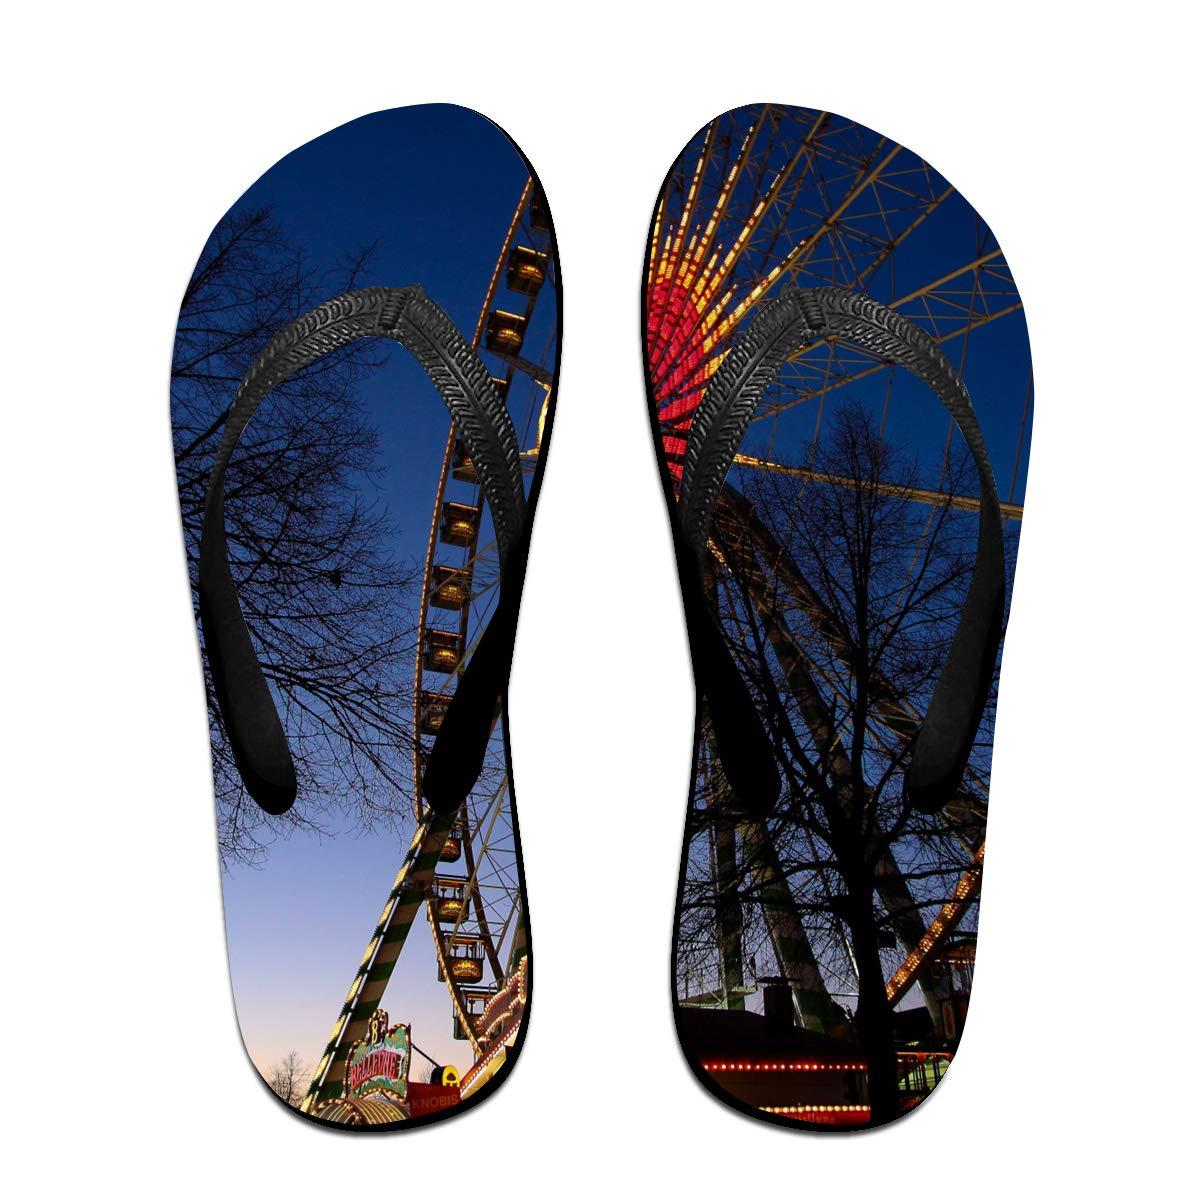 Couple Slipper Ferris Wheel In The Night Print Flip Flops Unisex Chic Sandals Rubber Non-Slip Beach Thong Slippers